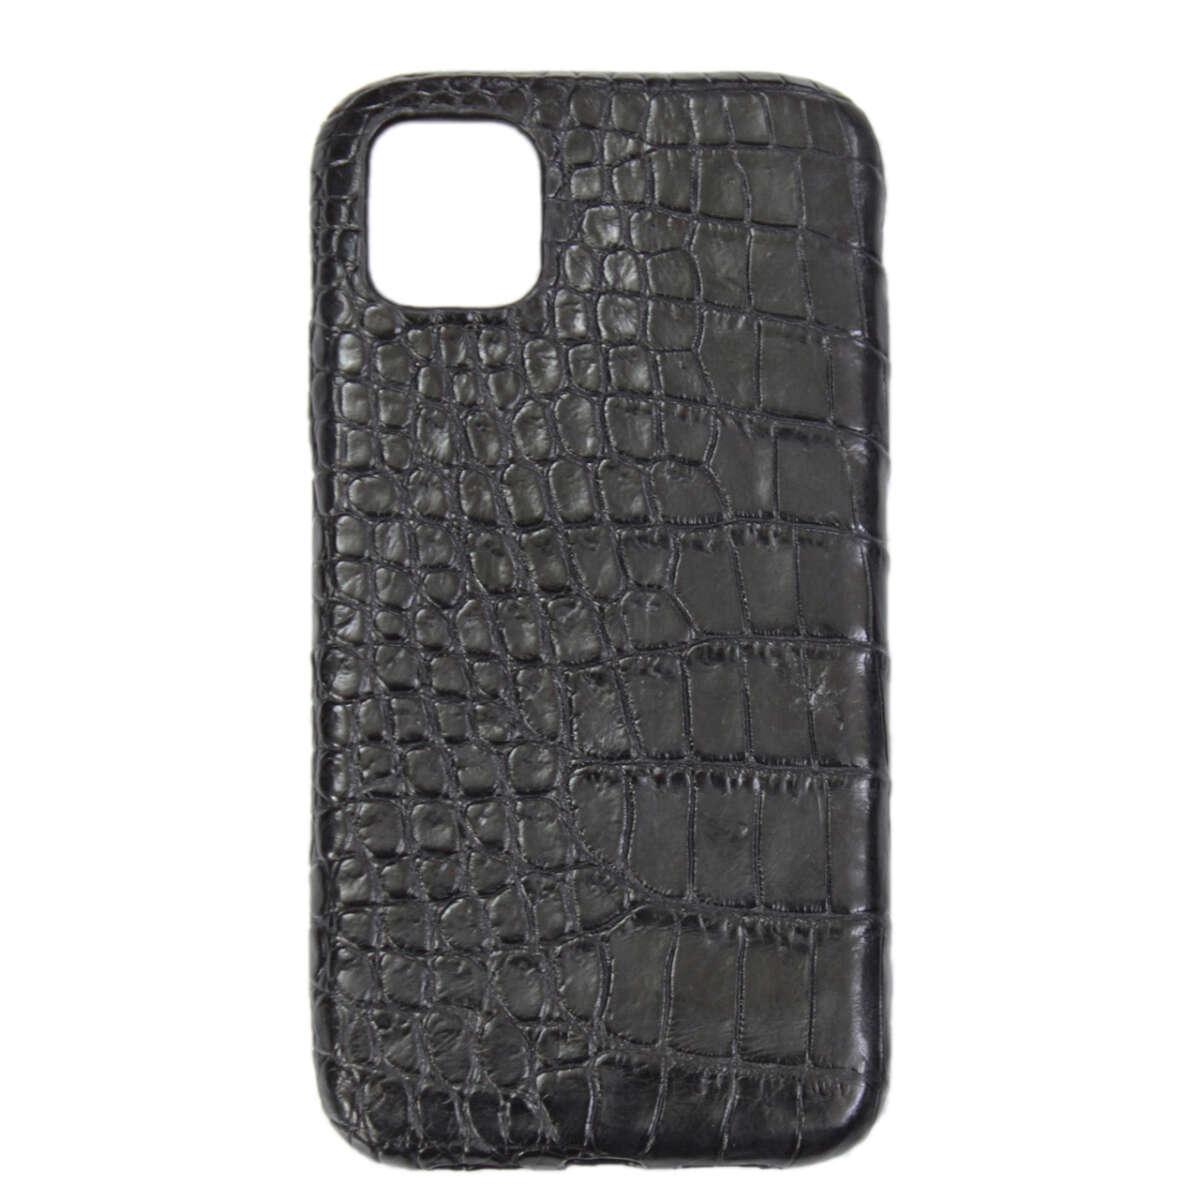 Ốp lưng iPhone 11 da cá sấu S1067a